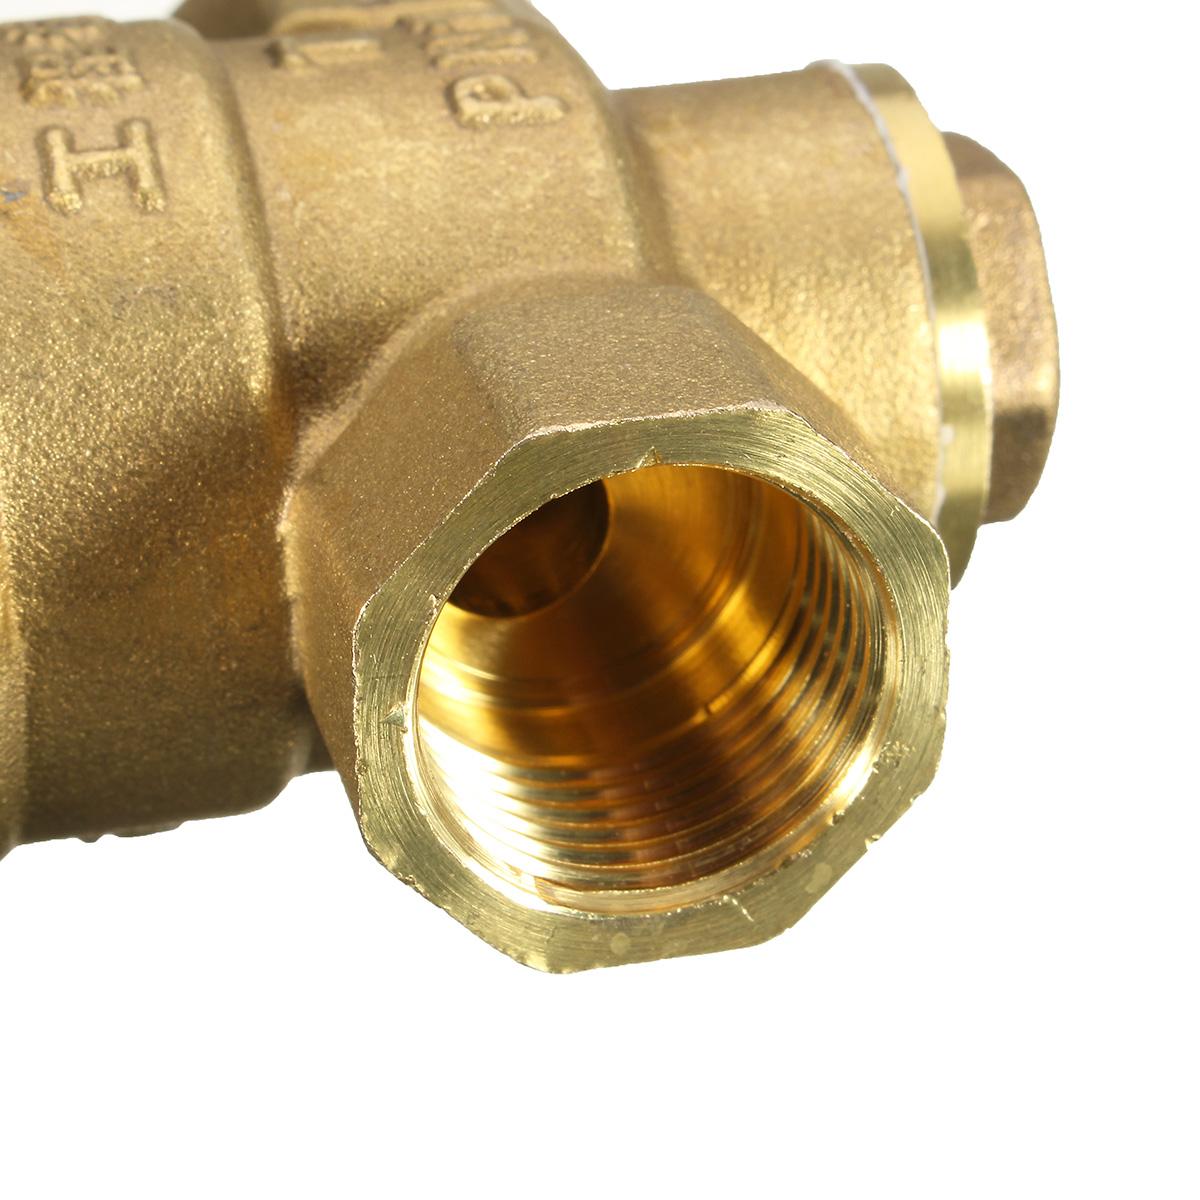 dn20 npt adjustable brass water pressure regulator reducer with gauge met. Black Bedroom Furniture Sets. Home Design Ideas